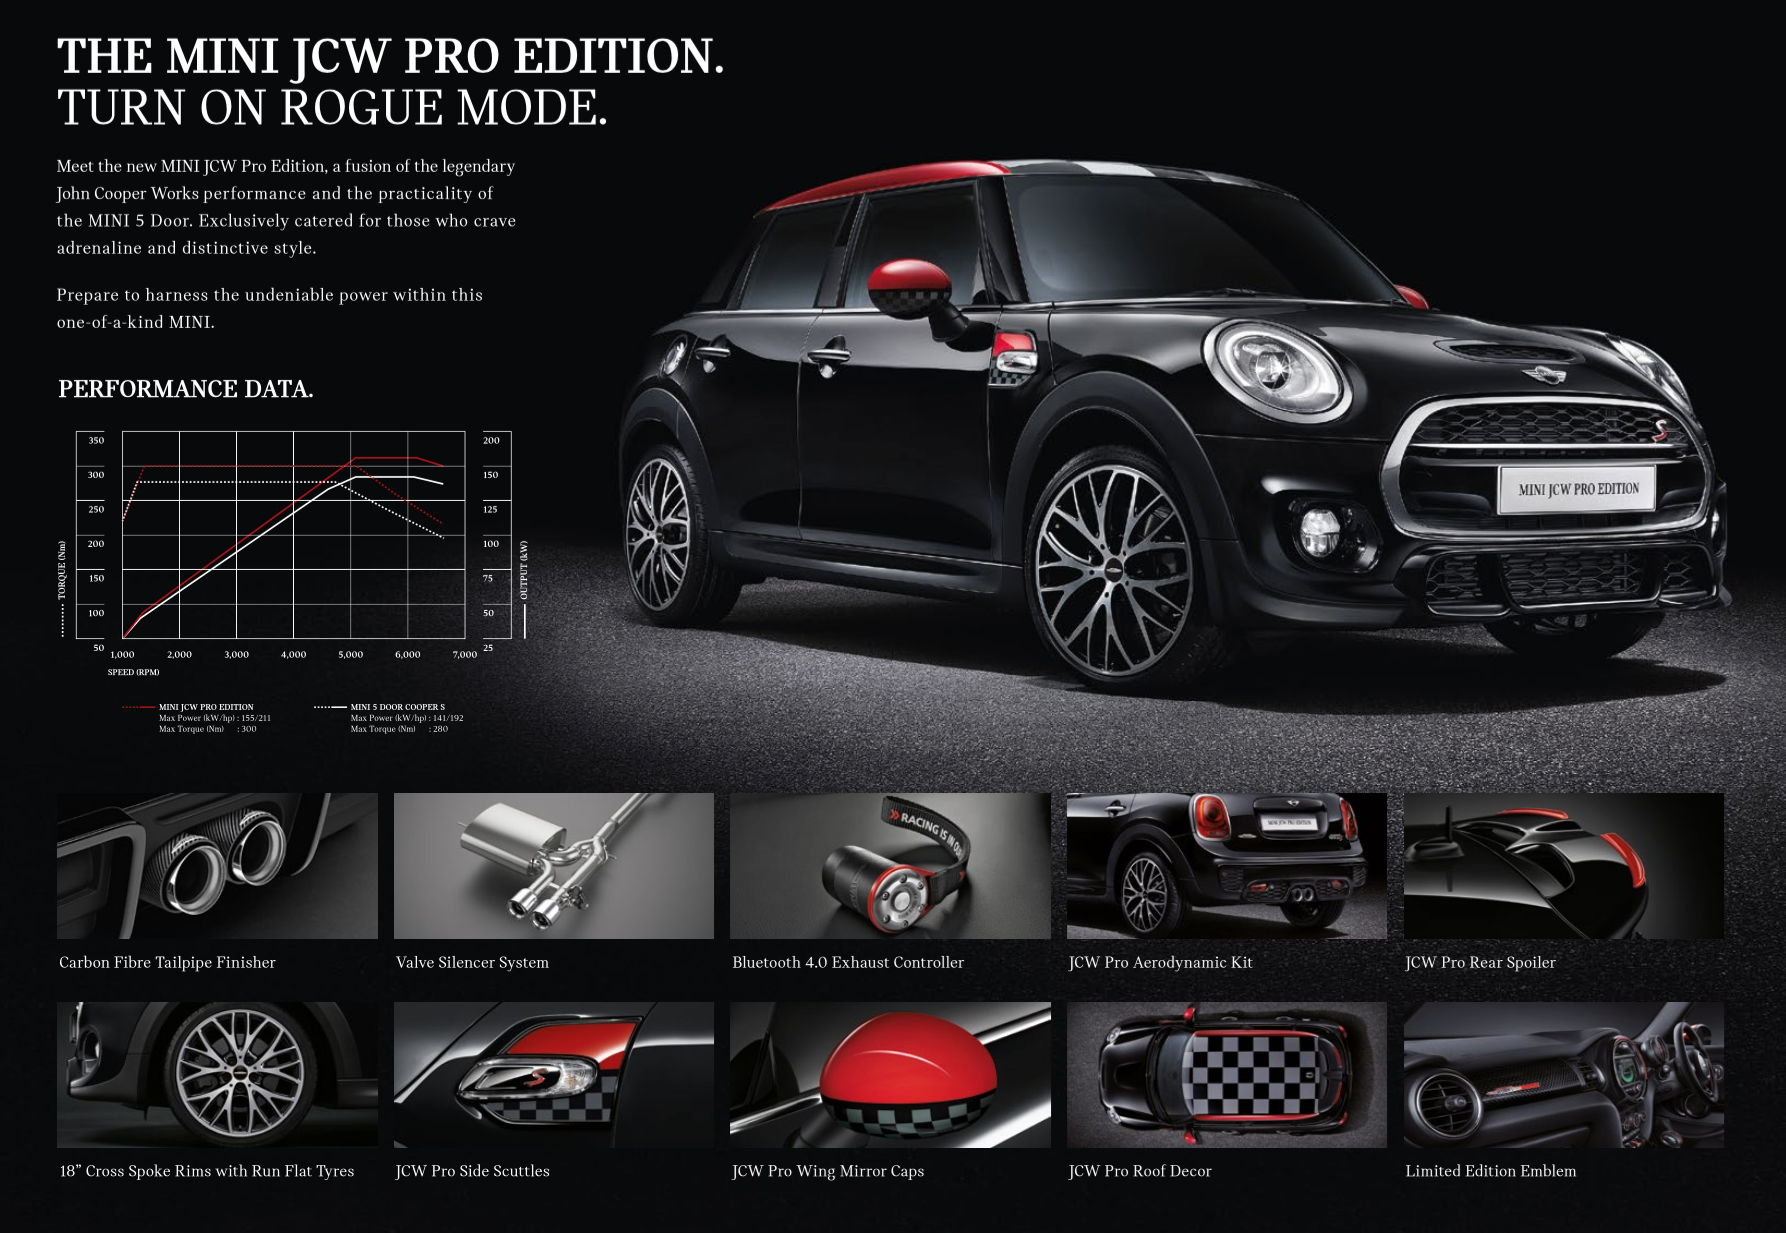 Mini F56 2018 >> GALLERY: MINI JCW Pro Edition at Auto Bavaria Paul Tan - Image 527174